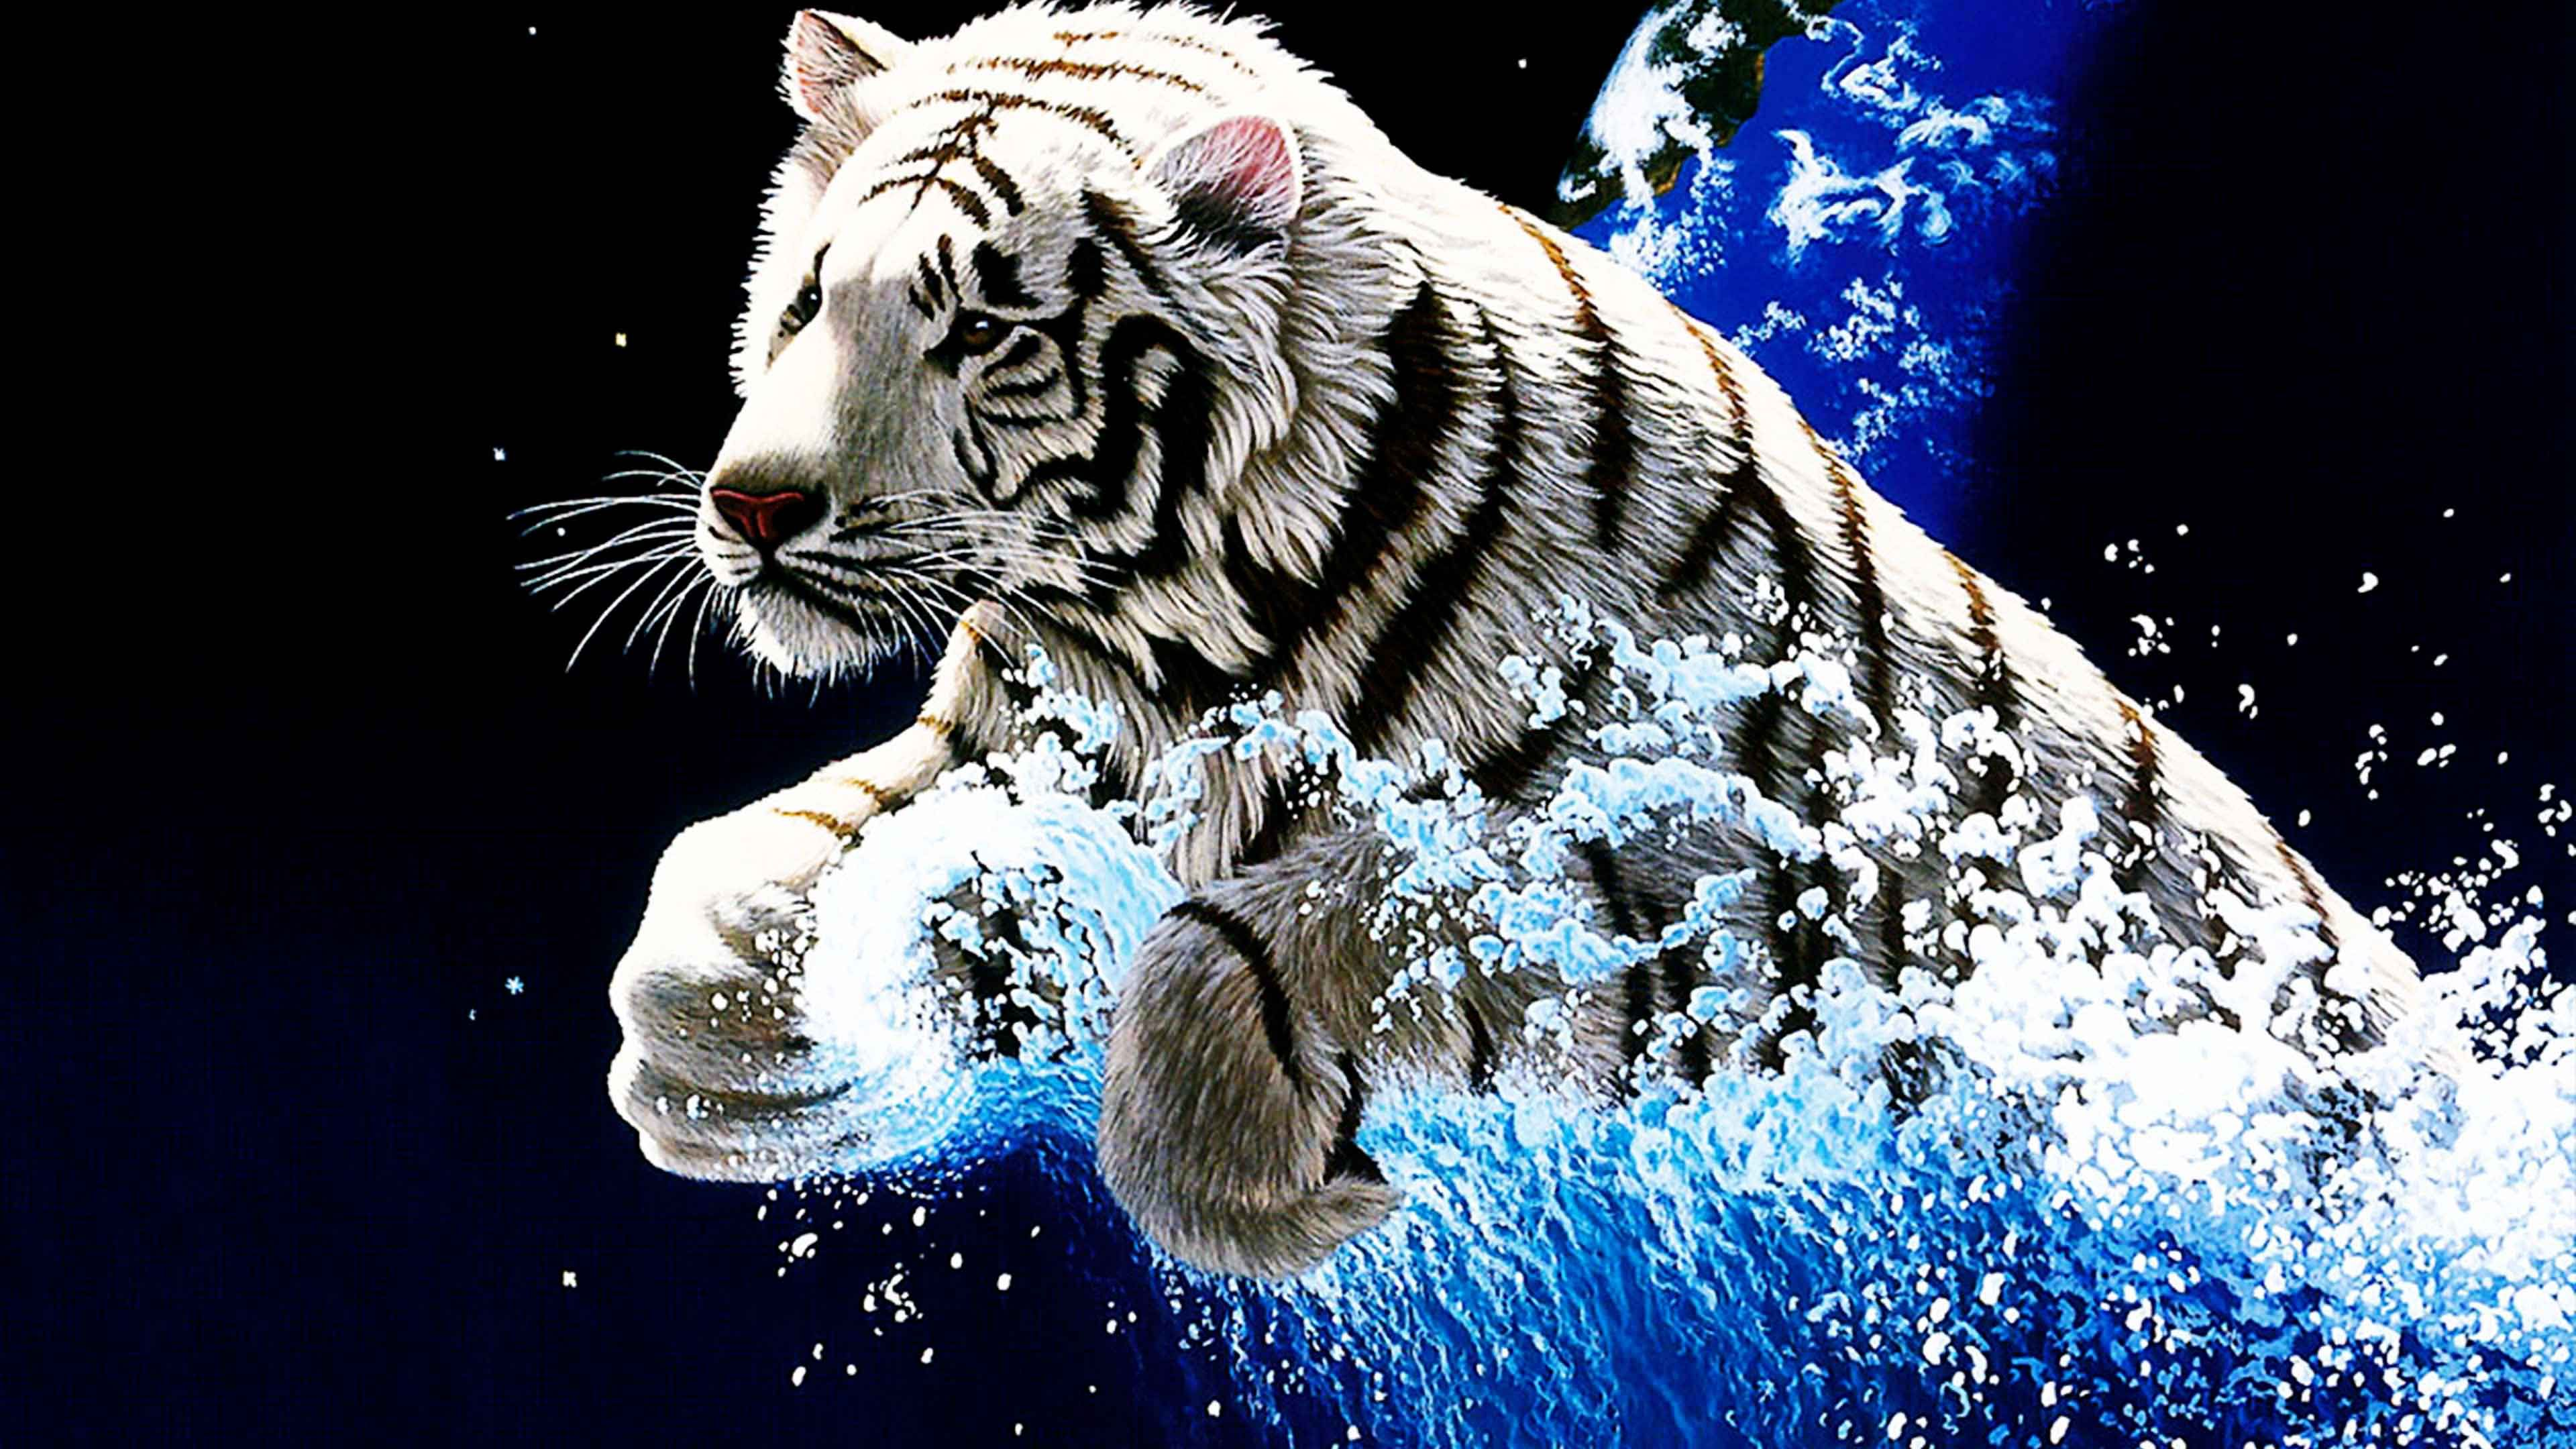 Tigger 3d Wallpapers Top Free Tigger 3d Backgrounds Wallpaperaccess